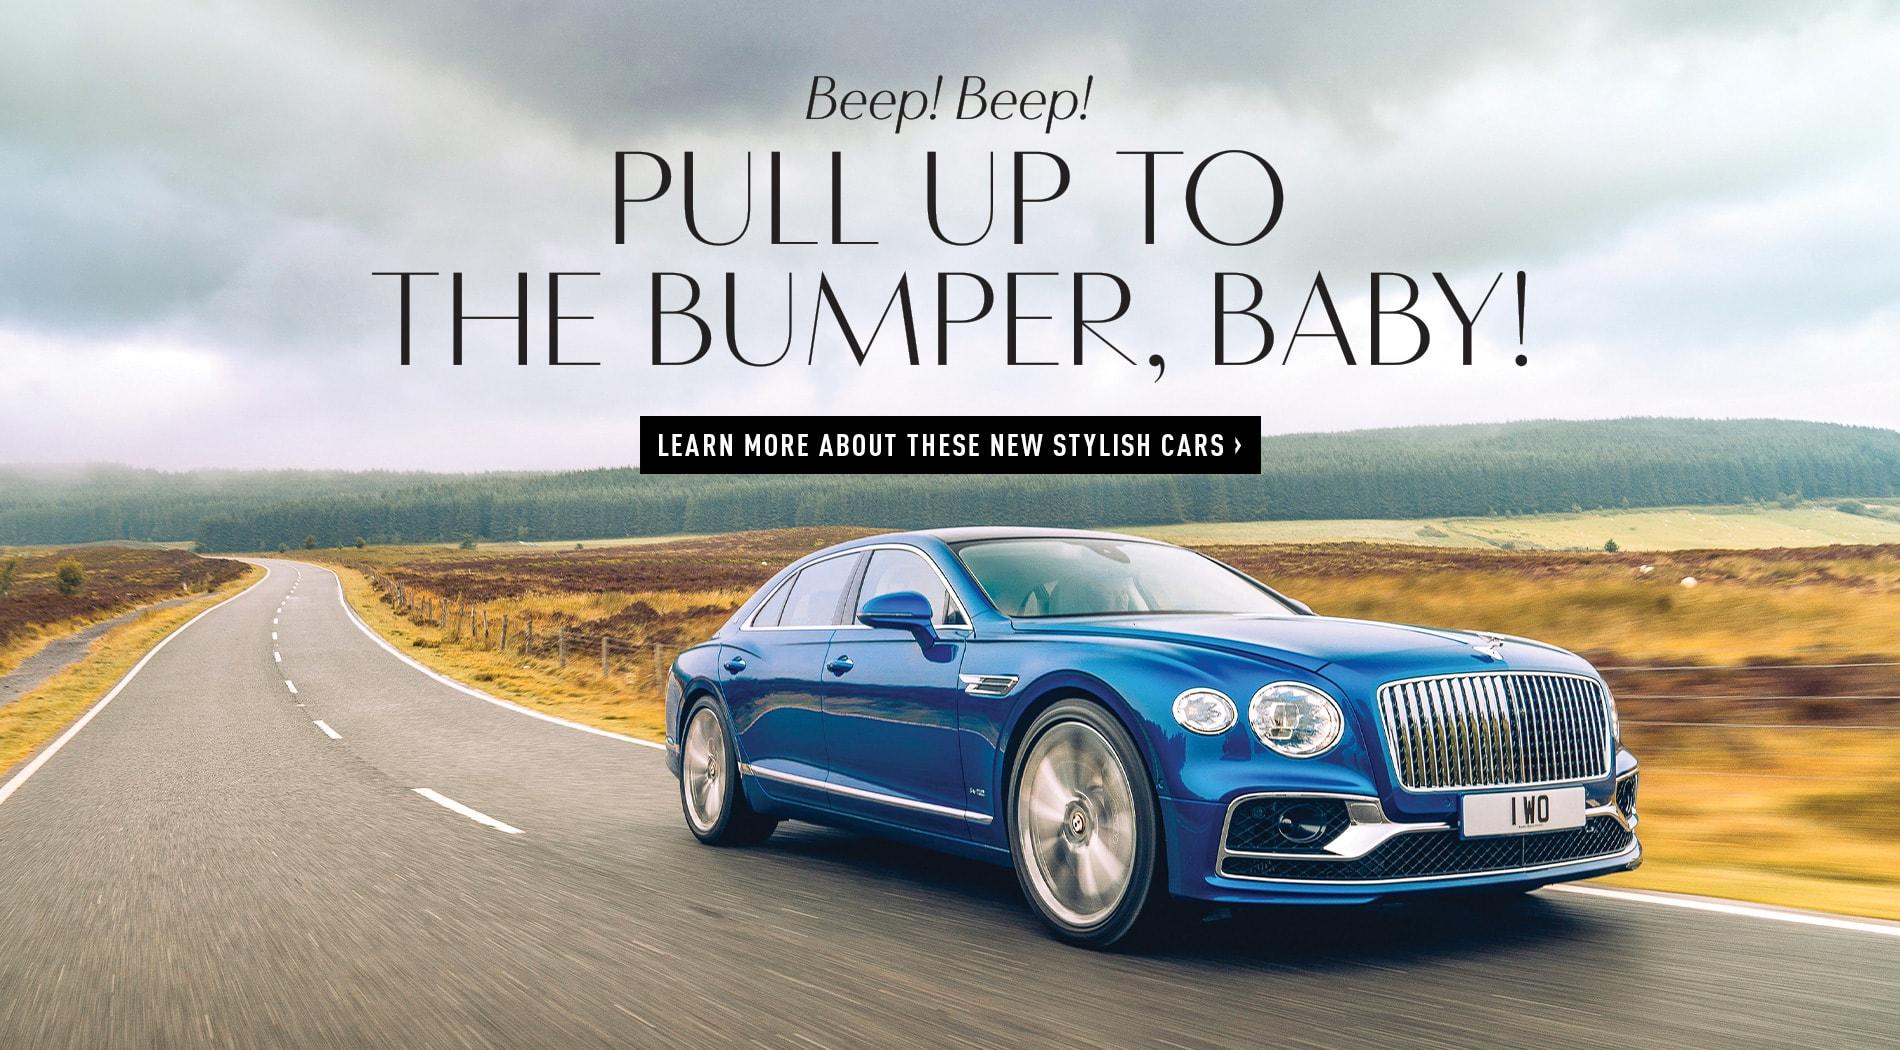 VIE magazine, Stylish Cars, 2020 McLaren GT, 2020 Bentley Flying Spur